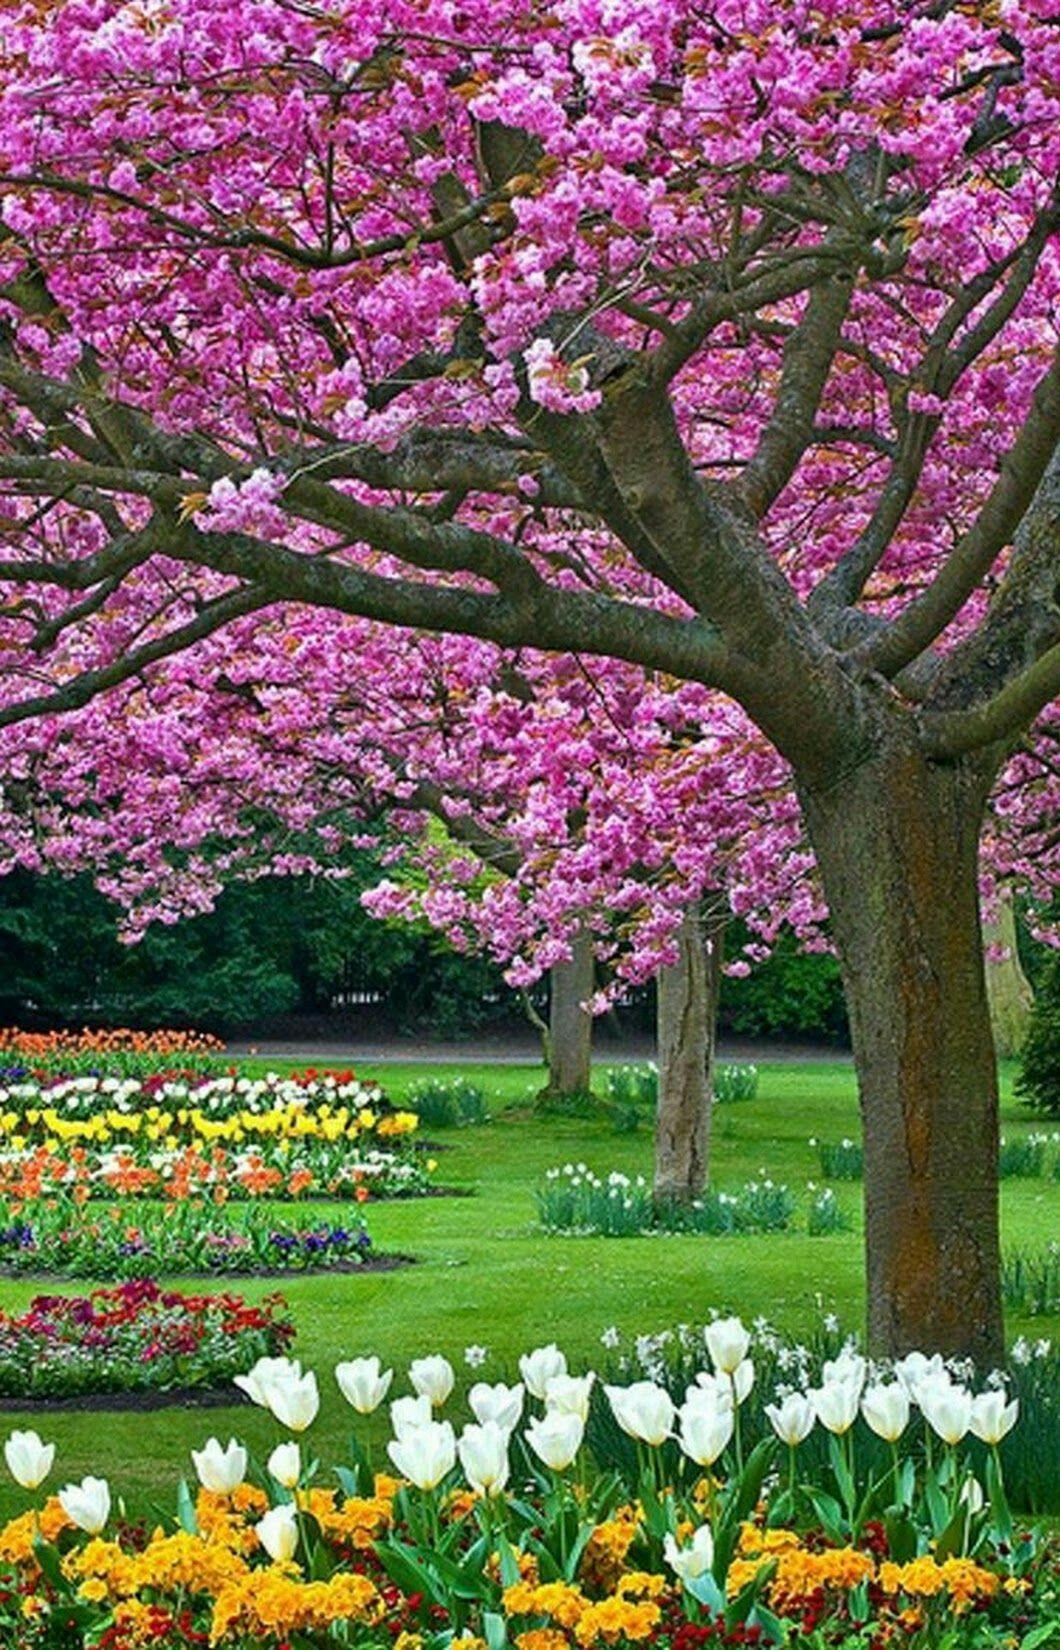 Beleza da natureza flowers and flower gardens in 2018 pinterest beleza da natureza spring landscape garden park gardens of the world dream garden izmirmasajfo